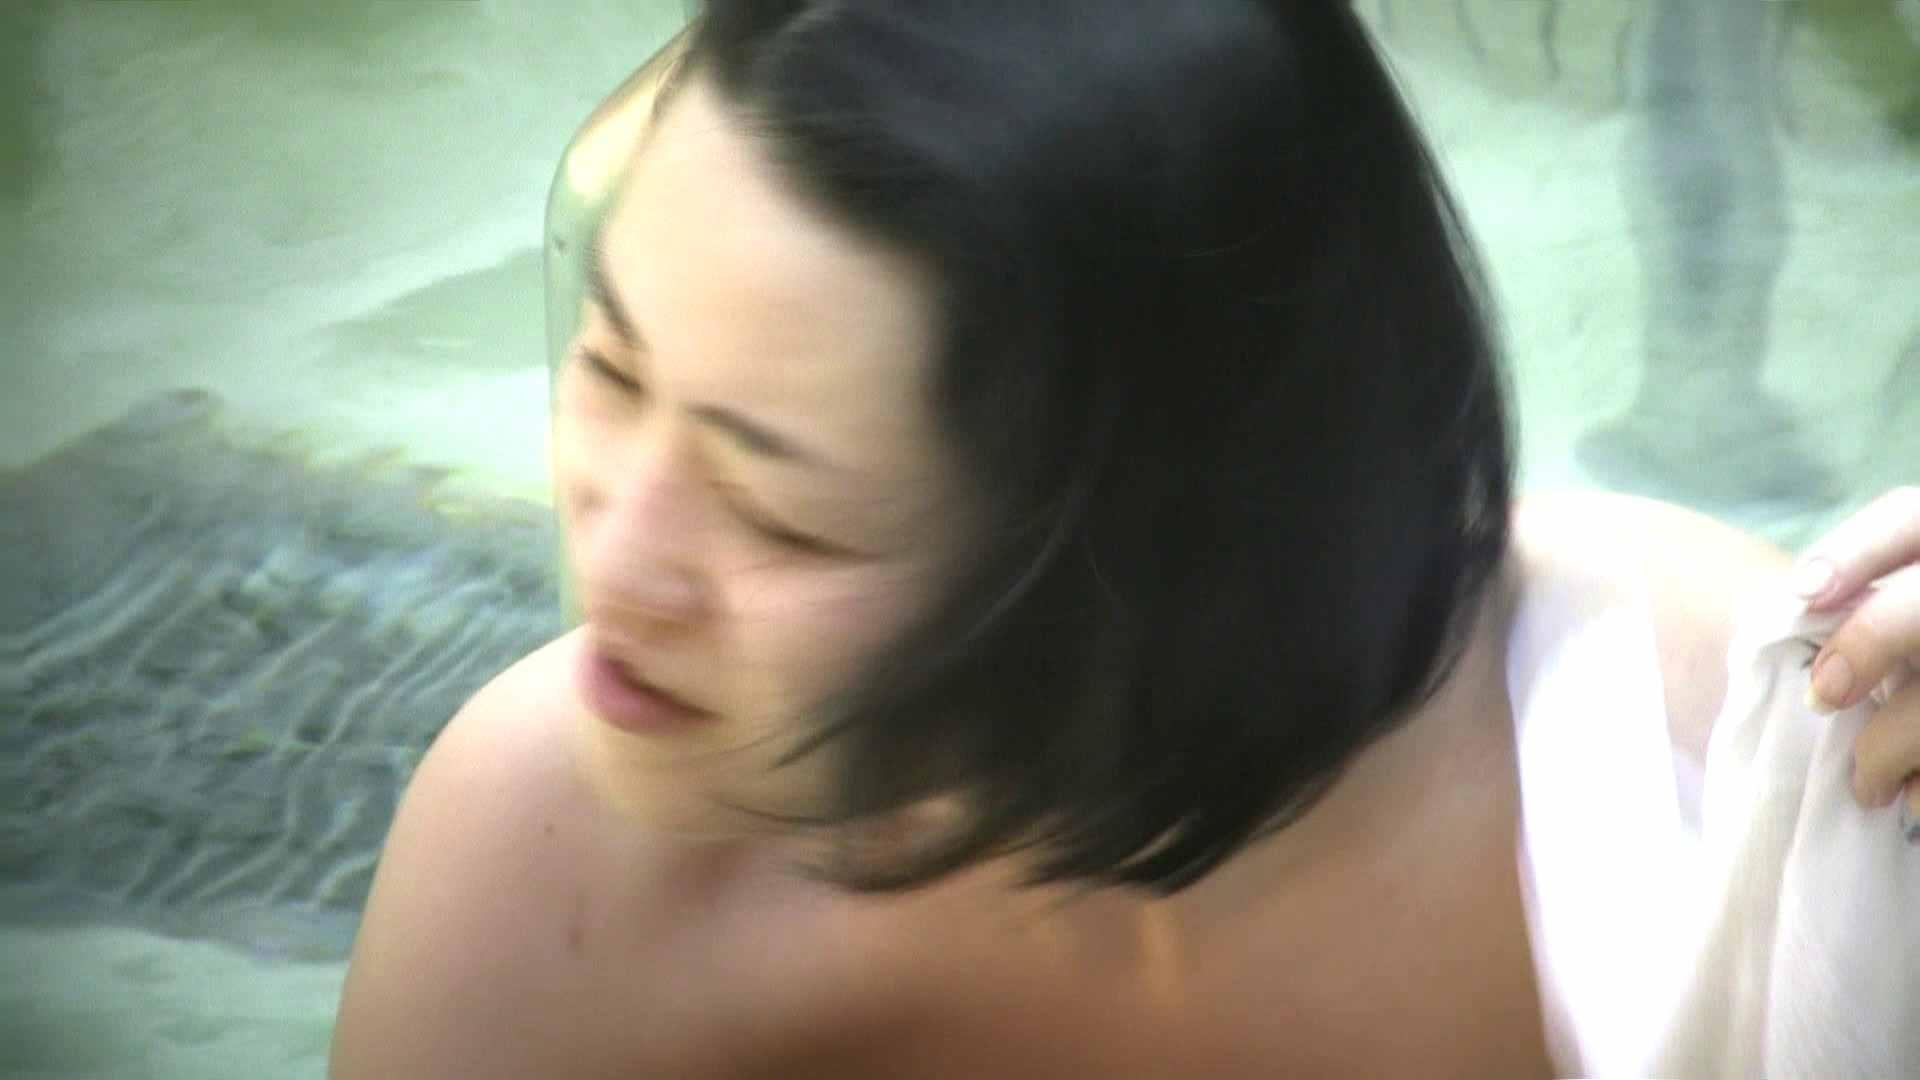 Aquaな露天風呂Vol.651 盗撮師作品 エロ無料画像 74pic 38